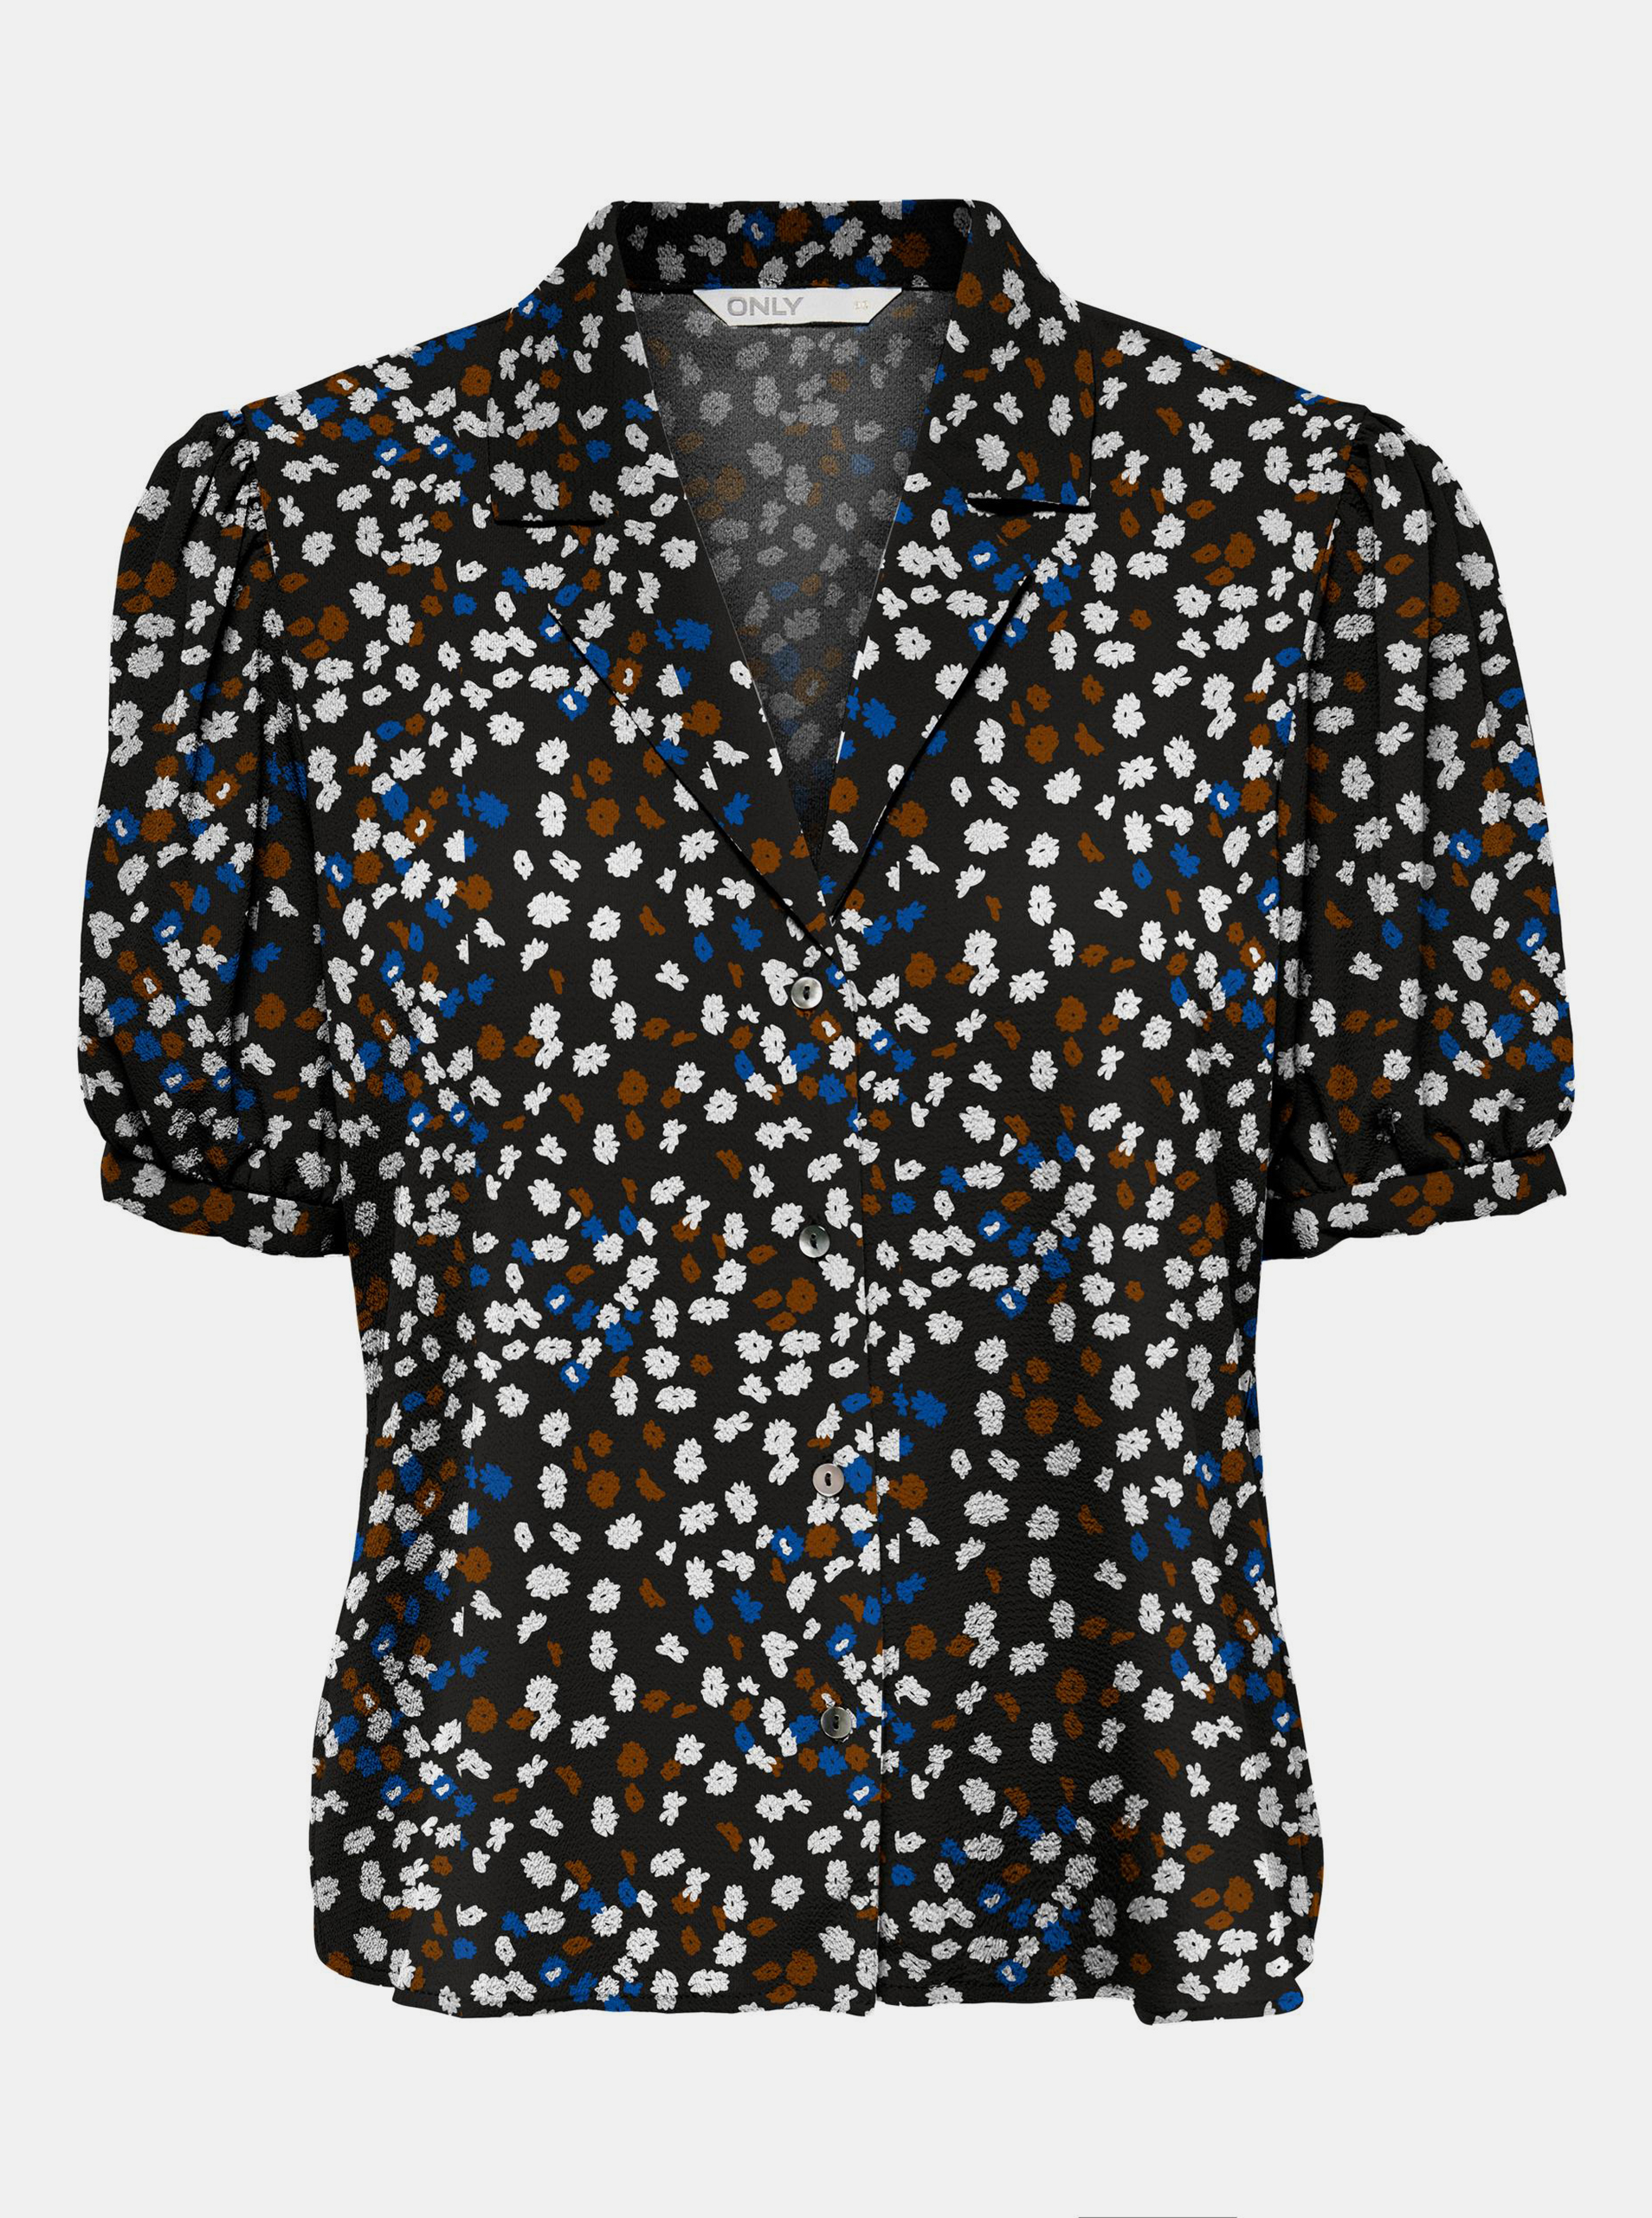 Only crna ženske bluza Nova s uzorkom